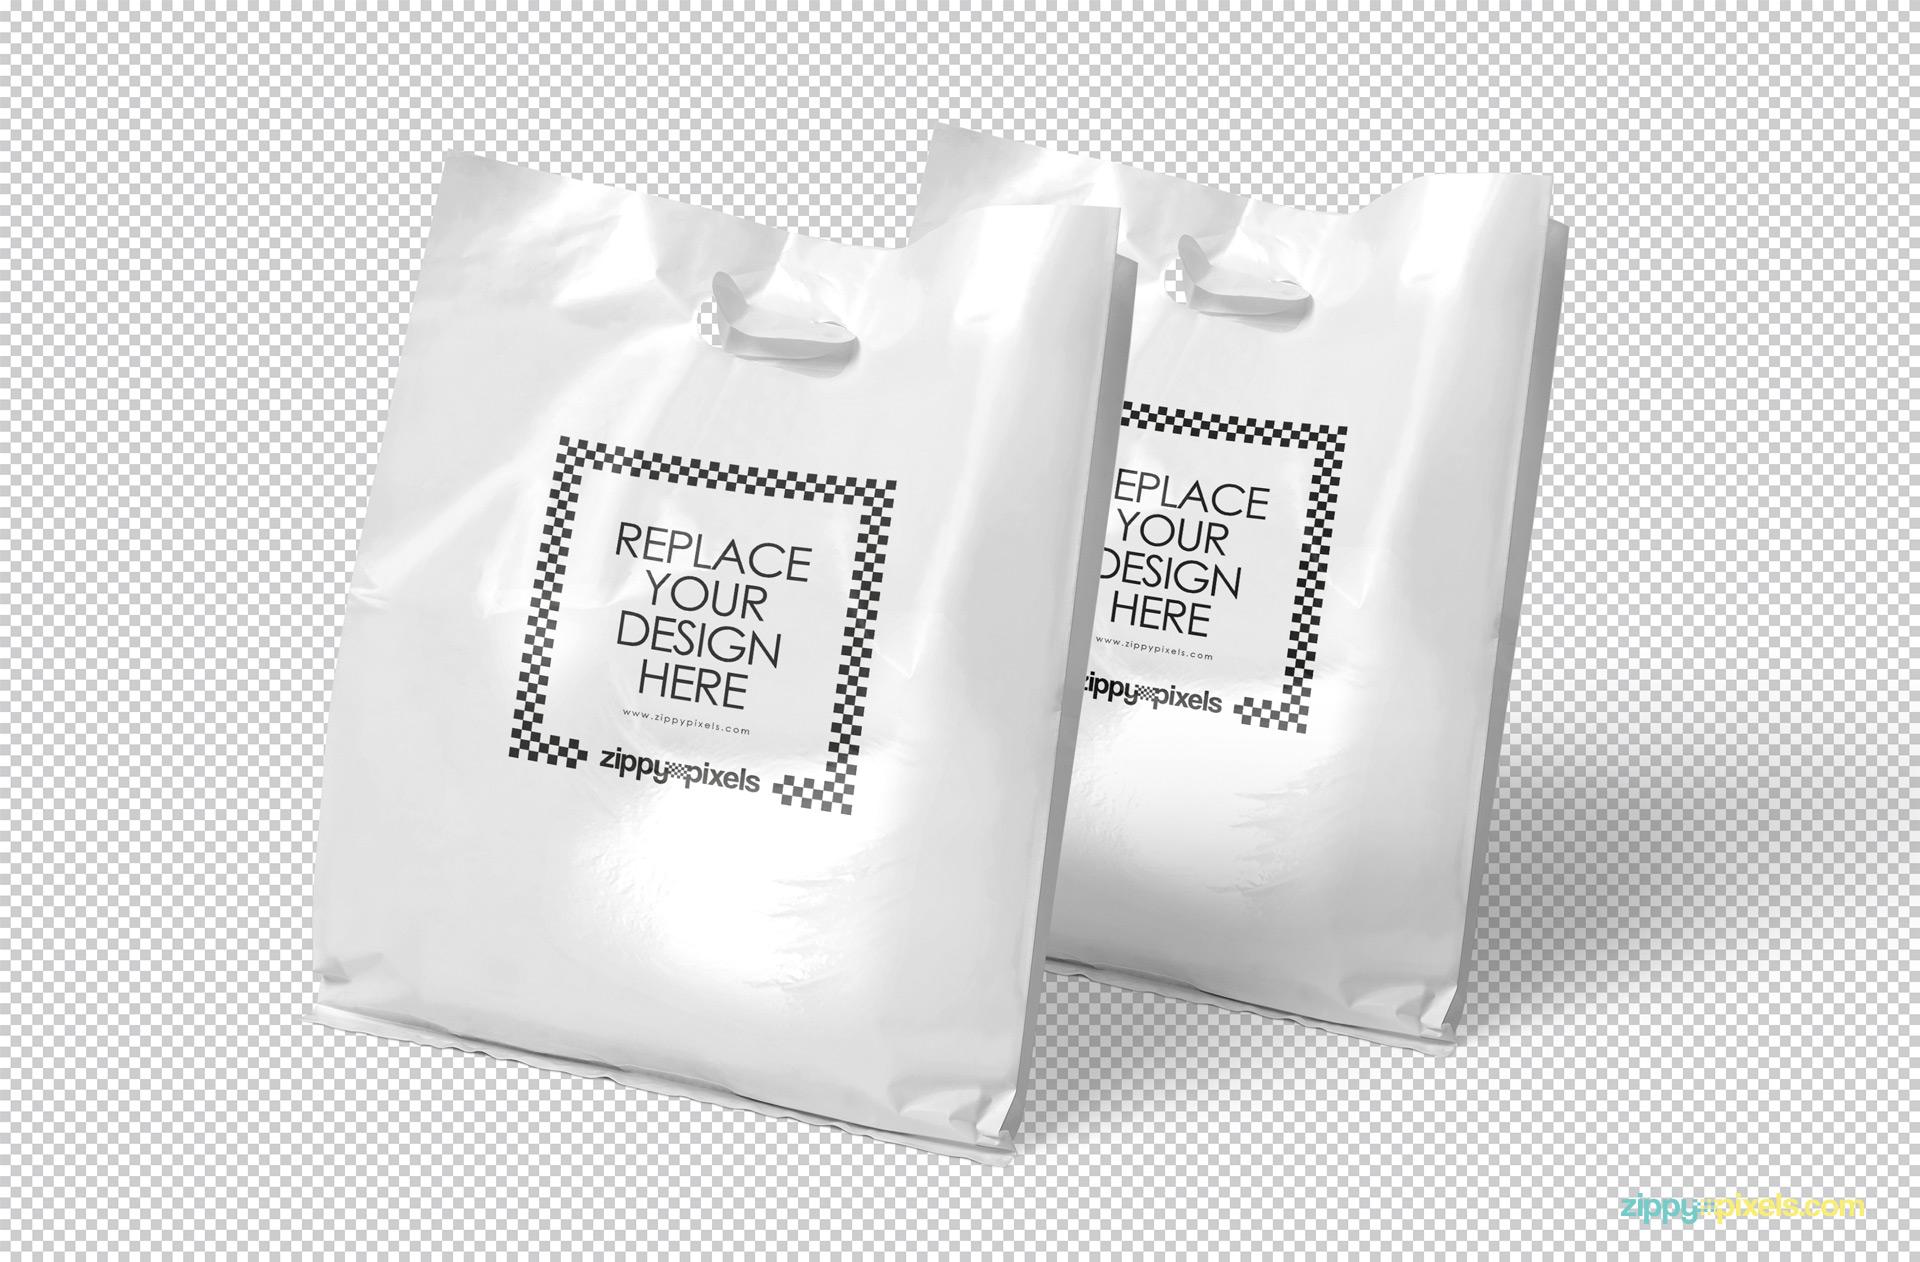 Free canvas bag mockup front view. Free Plastic Bag Mockup Zippypixels